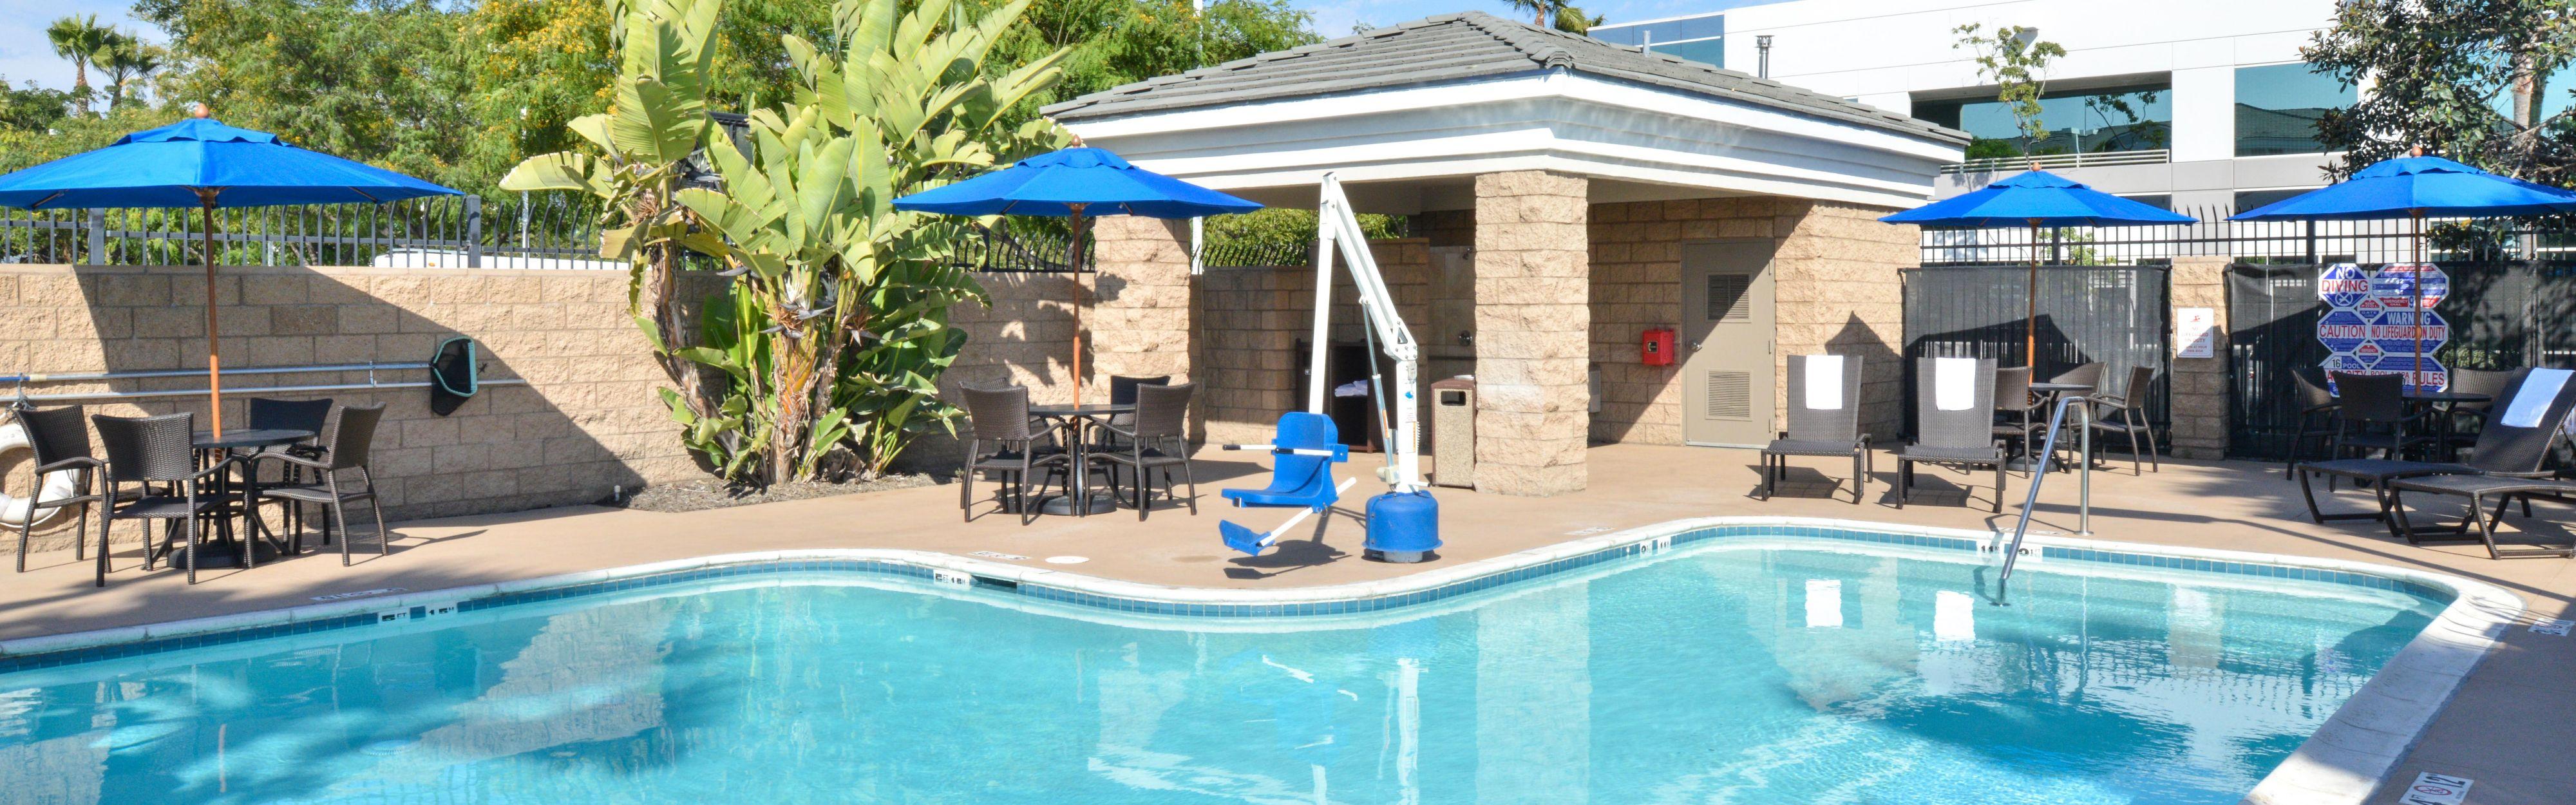 Holiday Inn Express & Suites San Diego Otay Mesa image 2